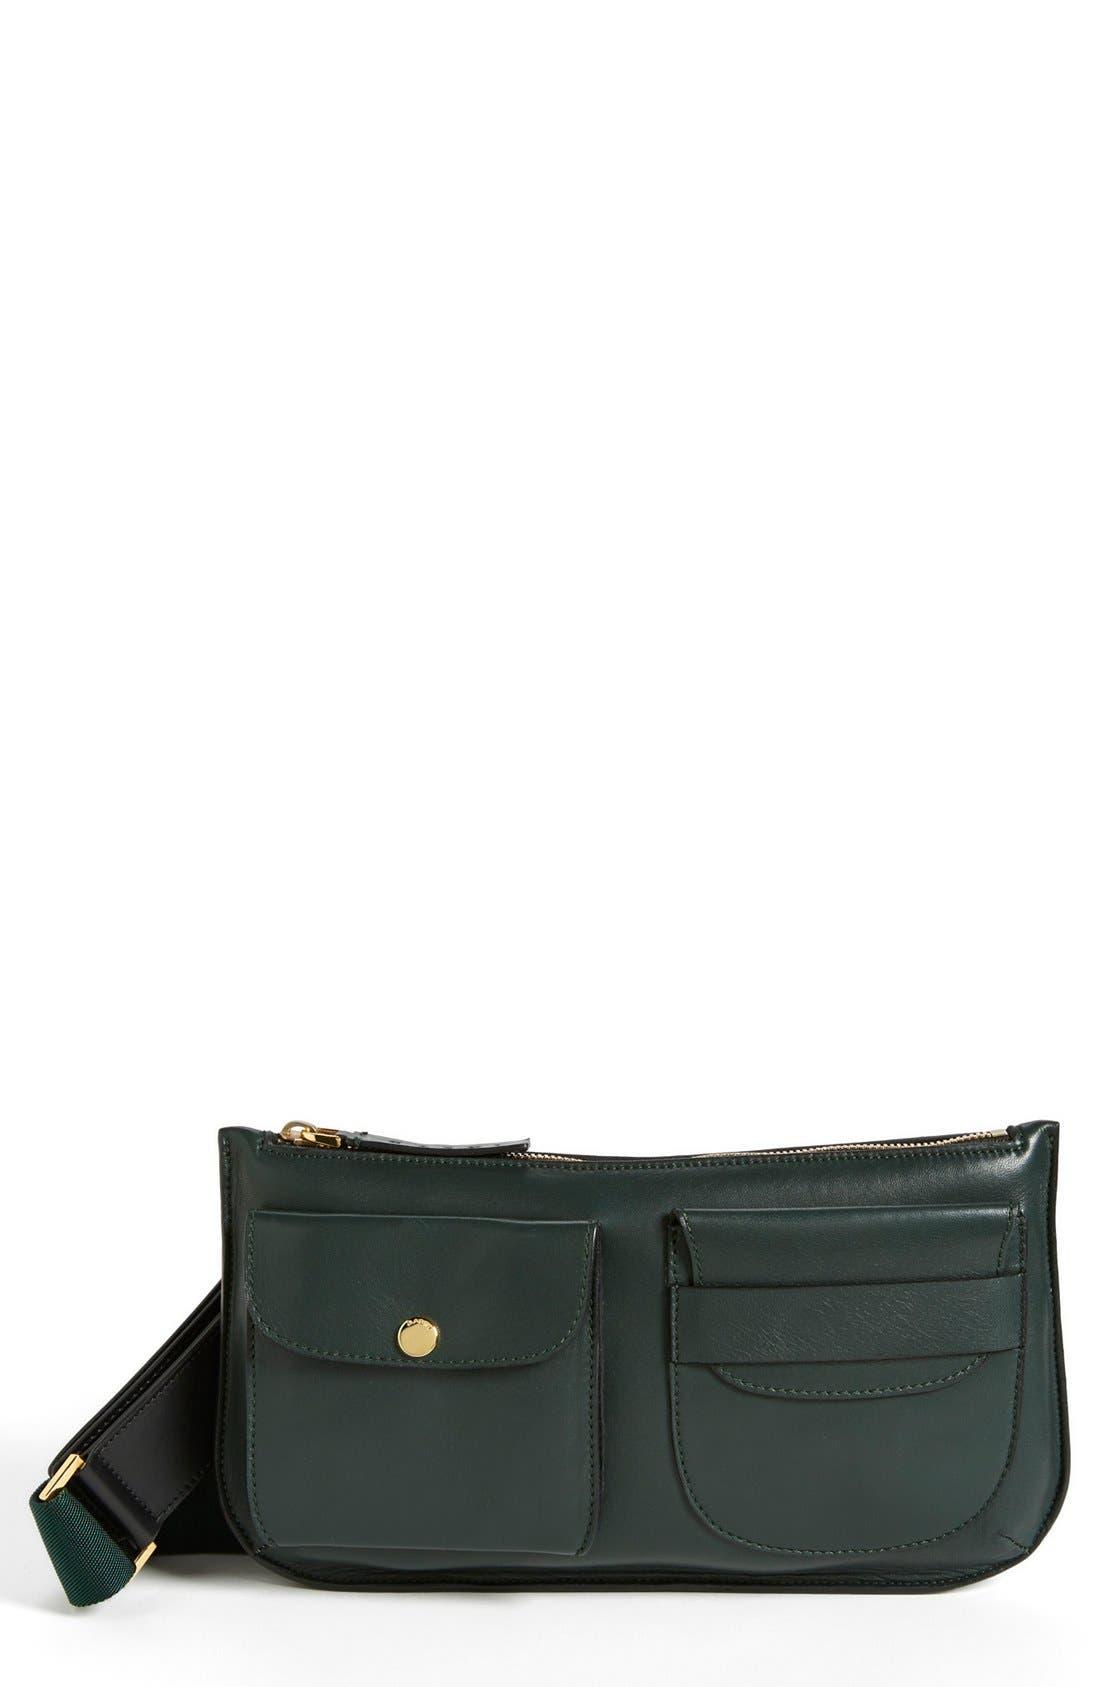 Main Image - Marni Leather Belt Bag